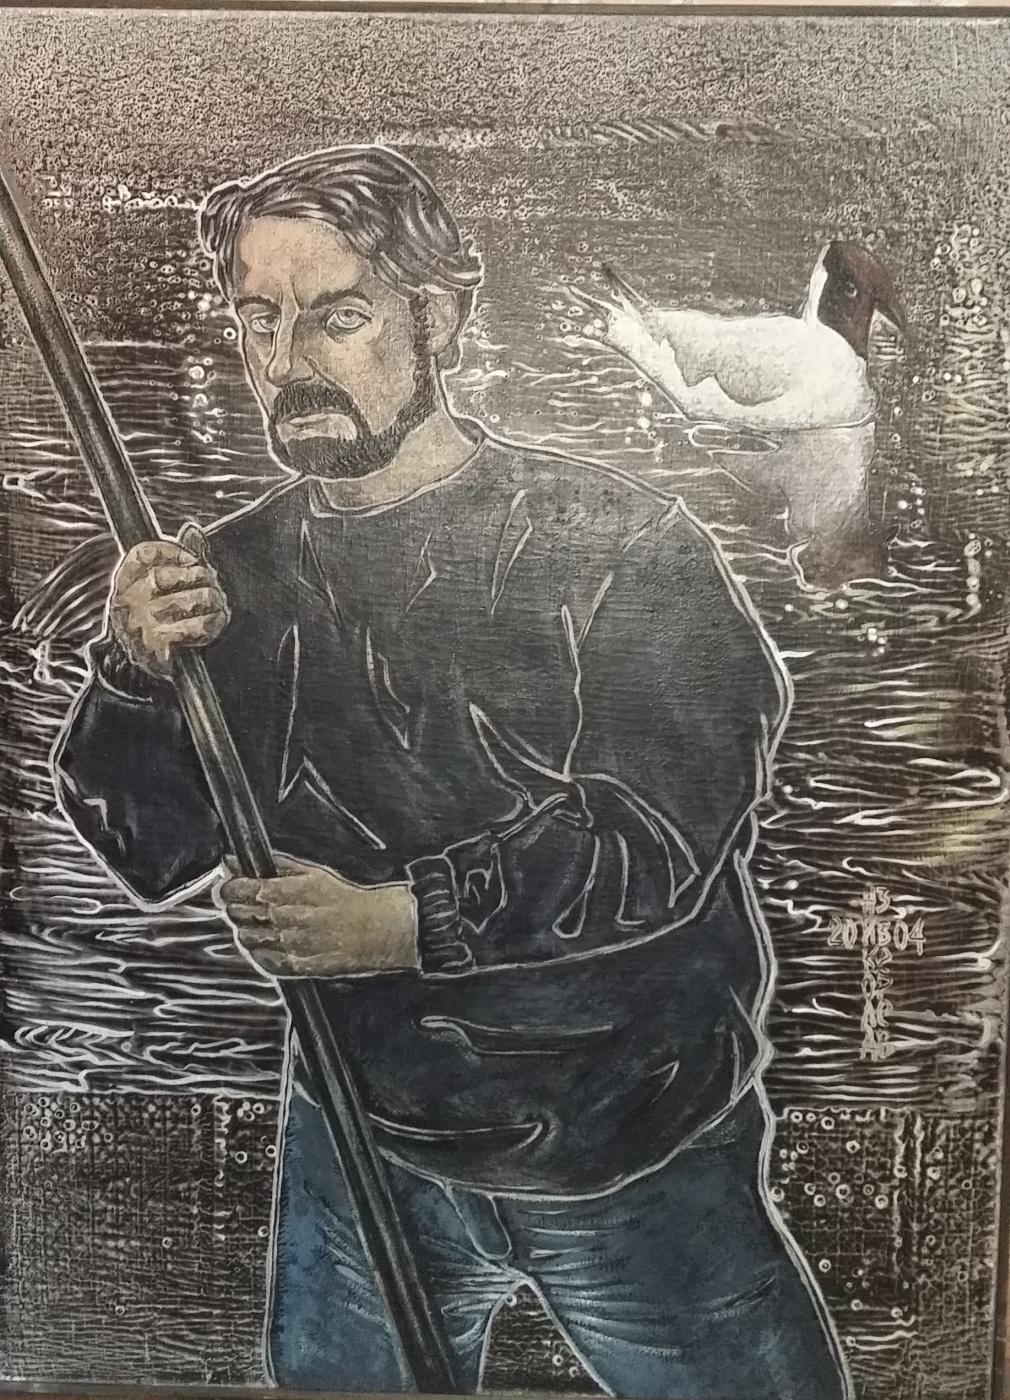 Nikolay Zverev. Boatman